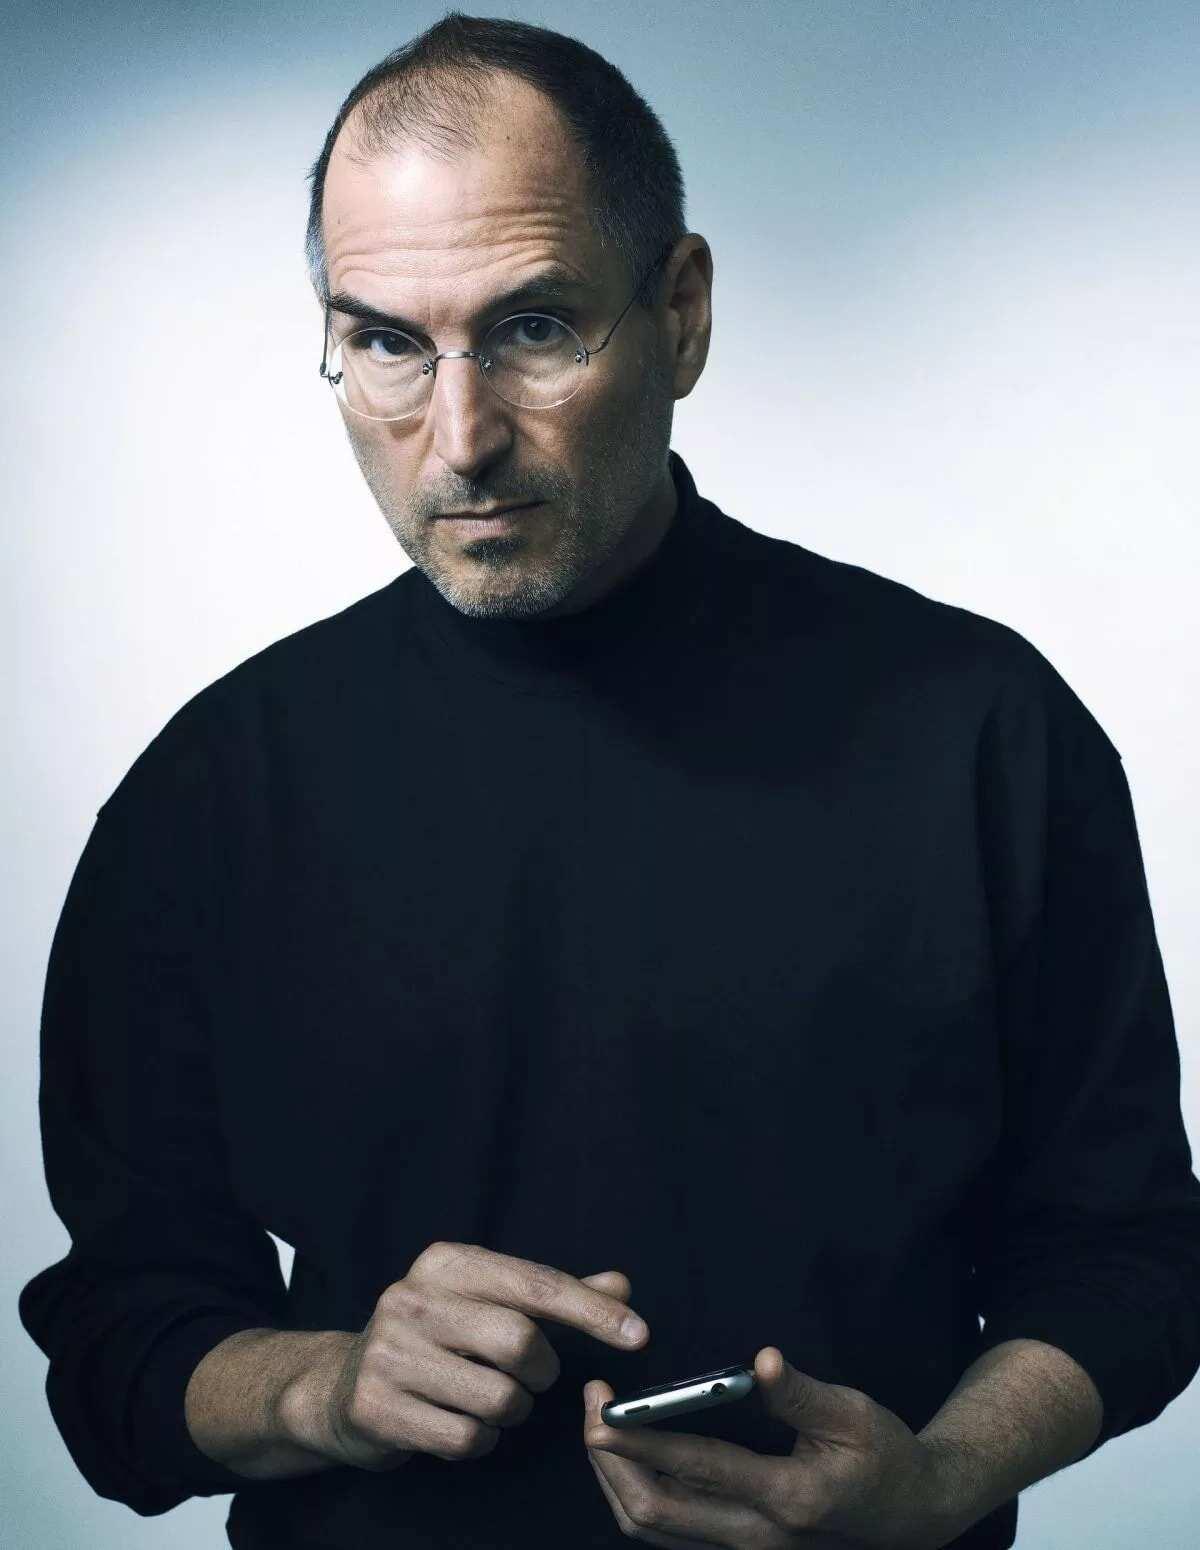 steve jobs quotes. entrepreneur quotes steve jobs. steve jobs quotes about business. steve jobs quotes work.